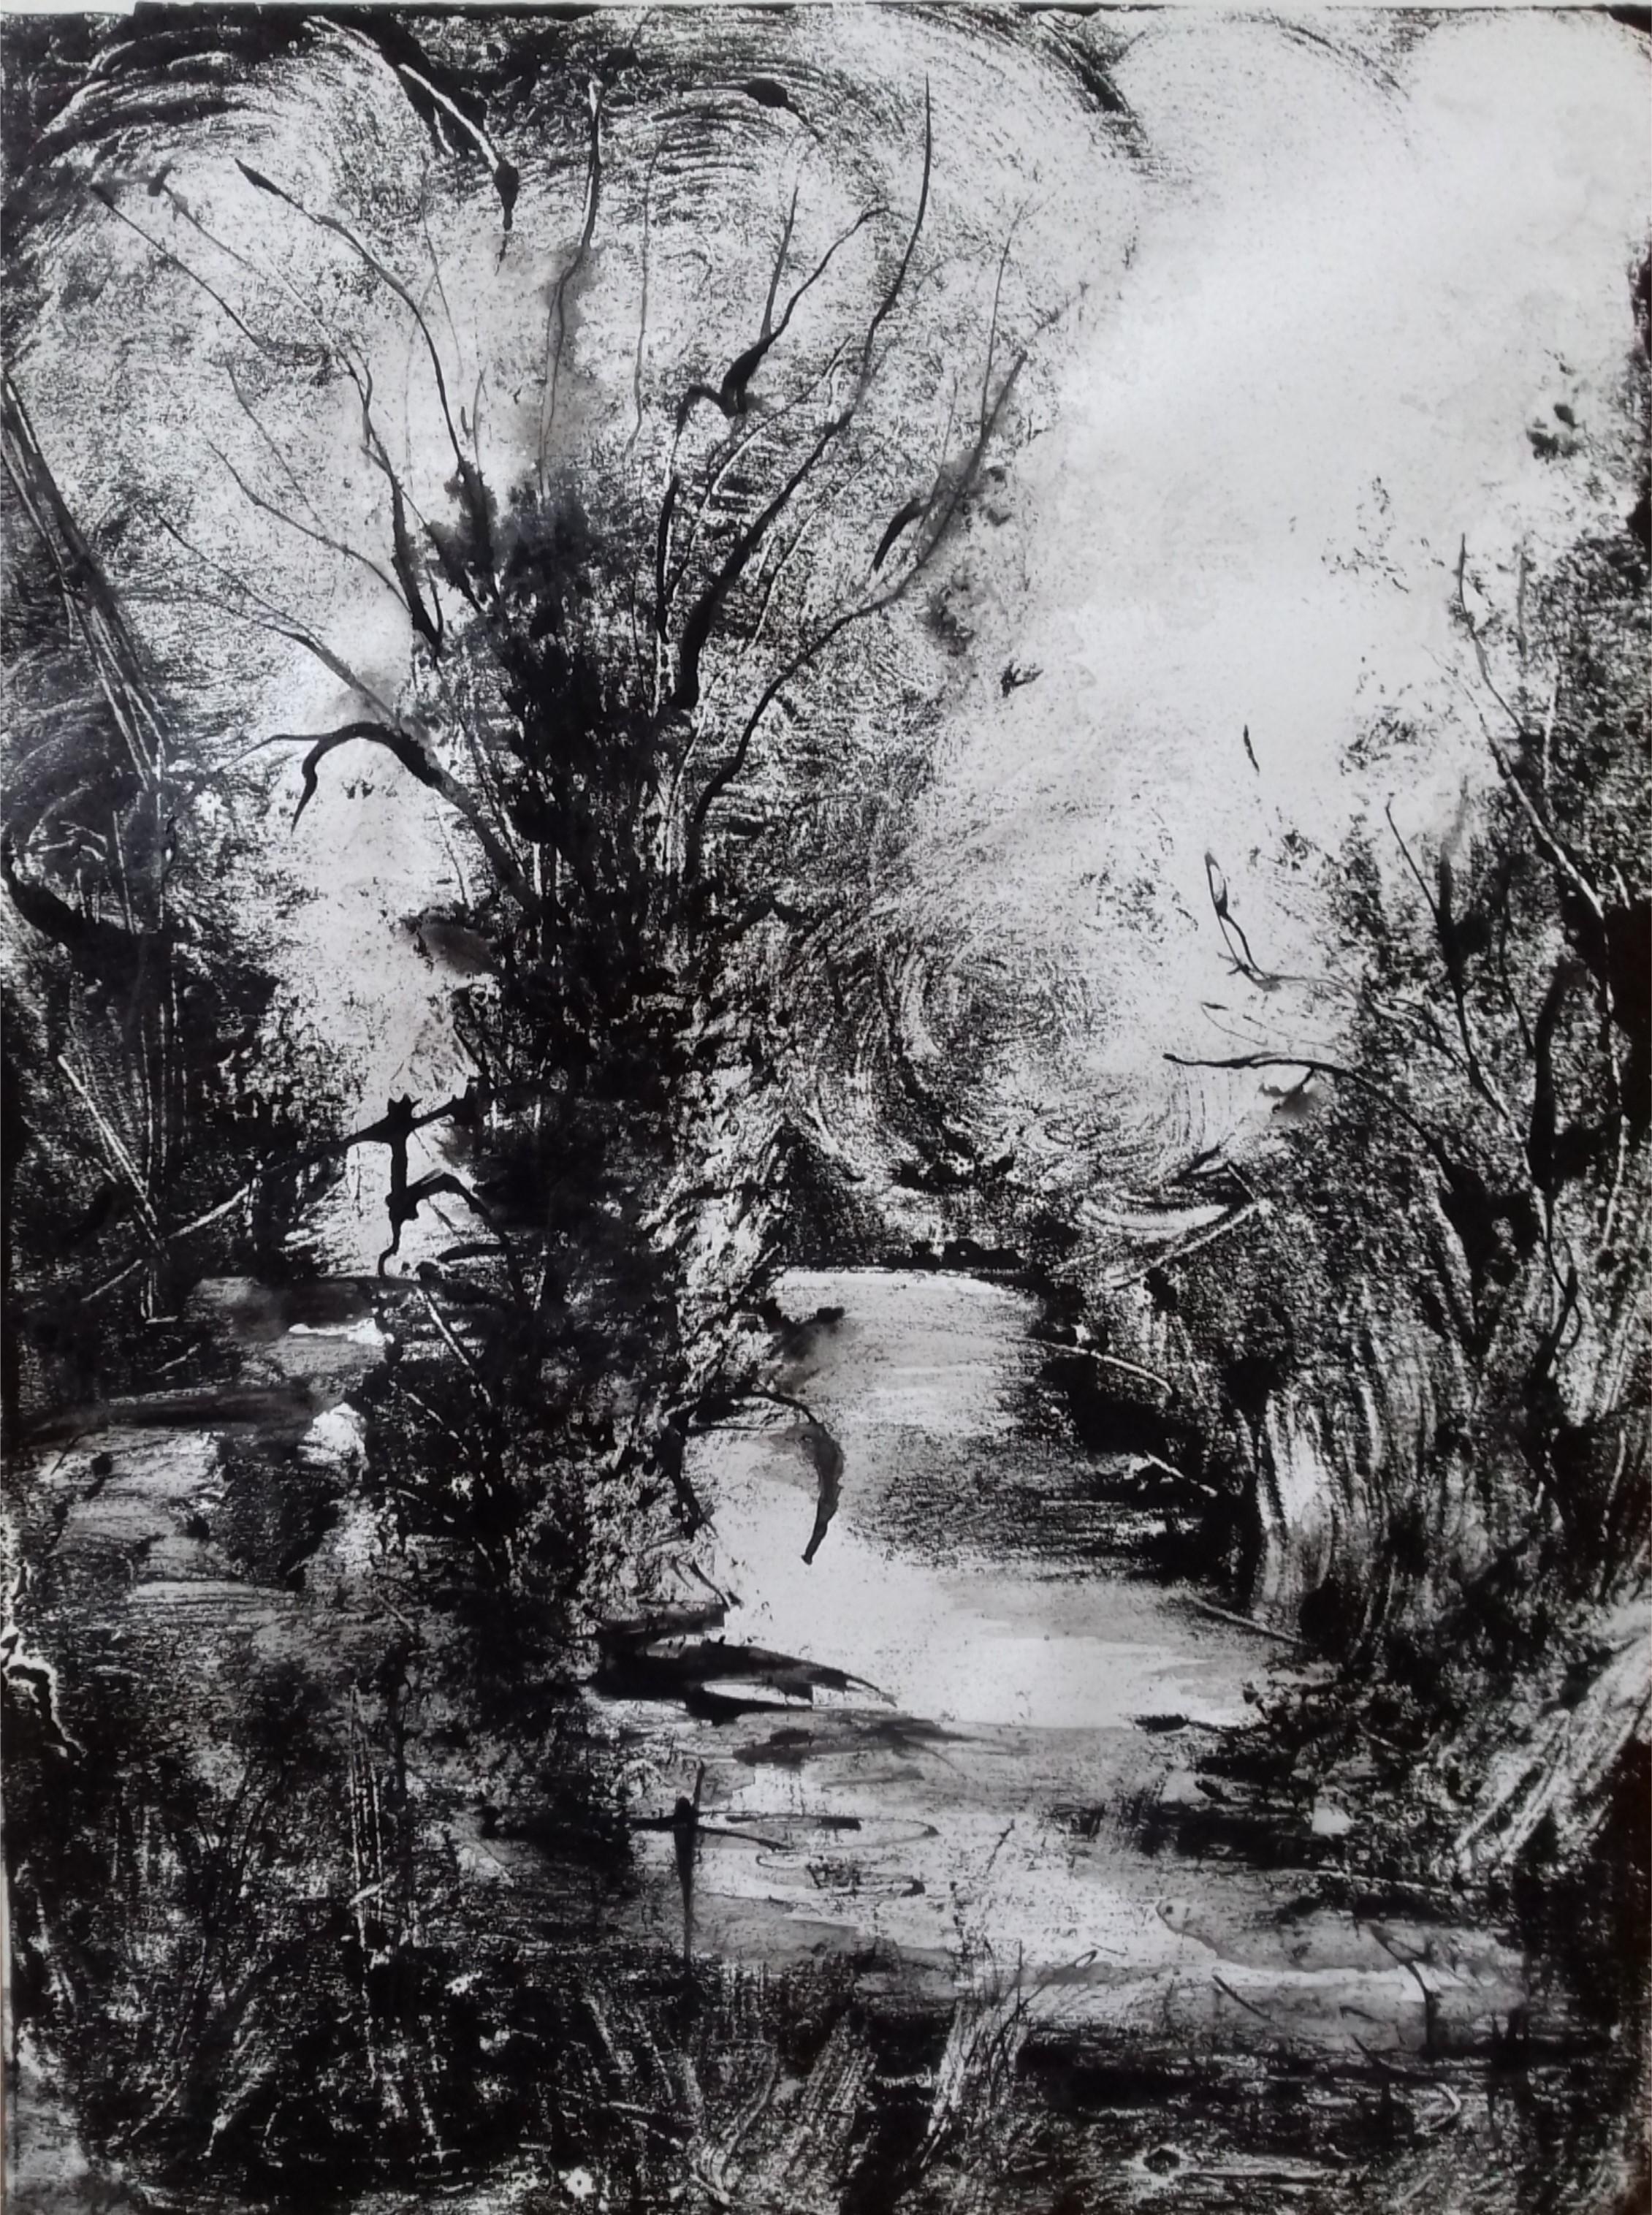 Mare, Monotype encre, 30x40 cm, 2018